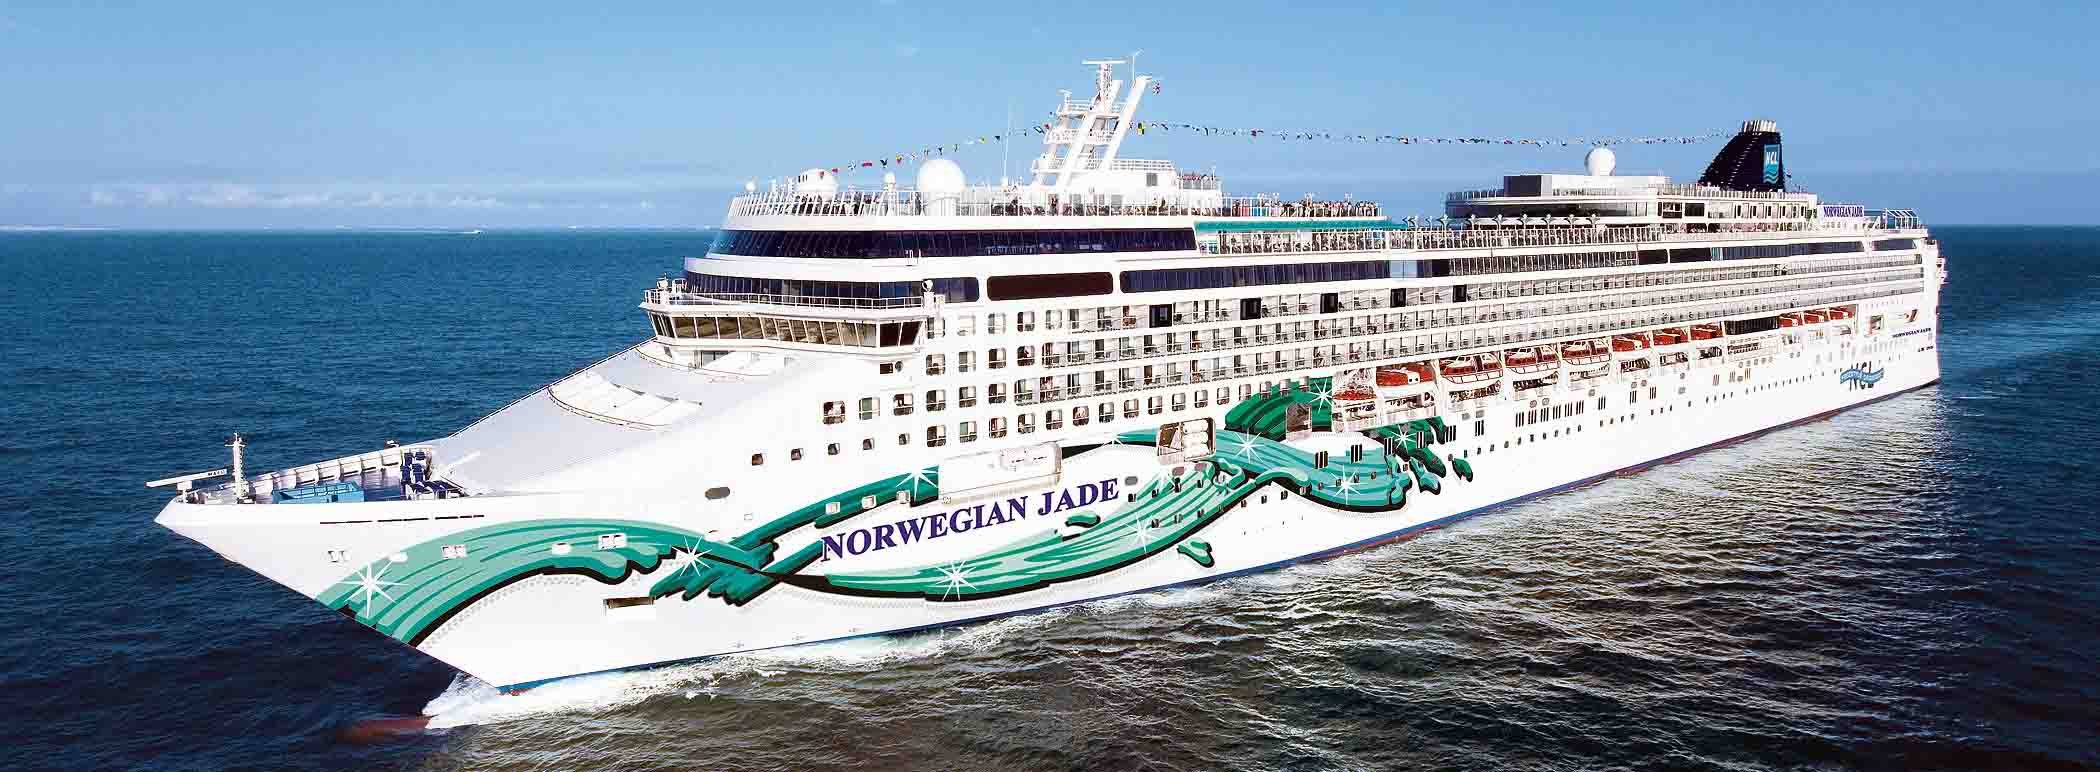 Norwegian Jade 18 (main)